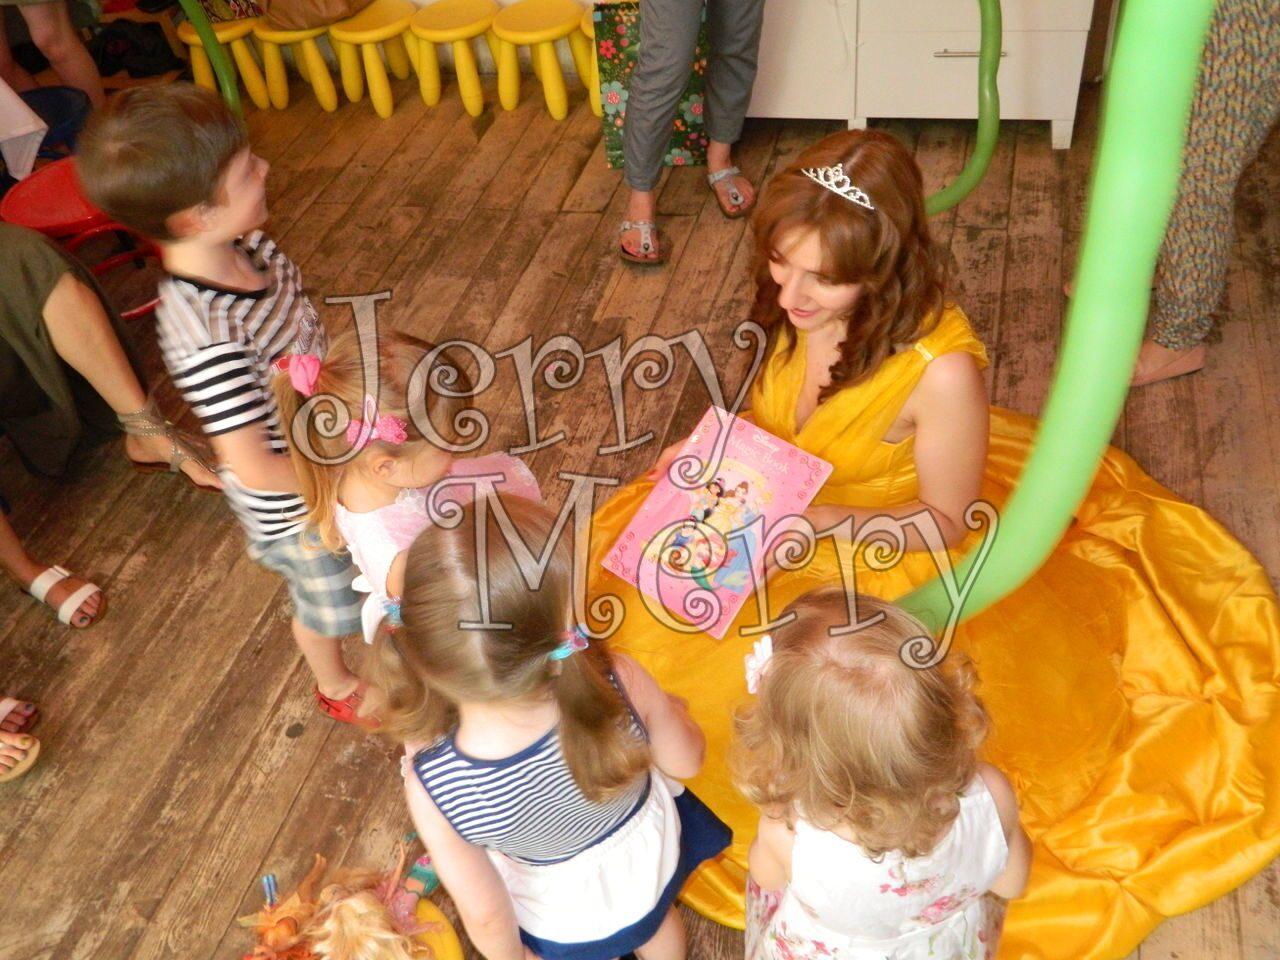 игра знакомство на детский праздник